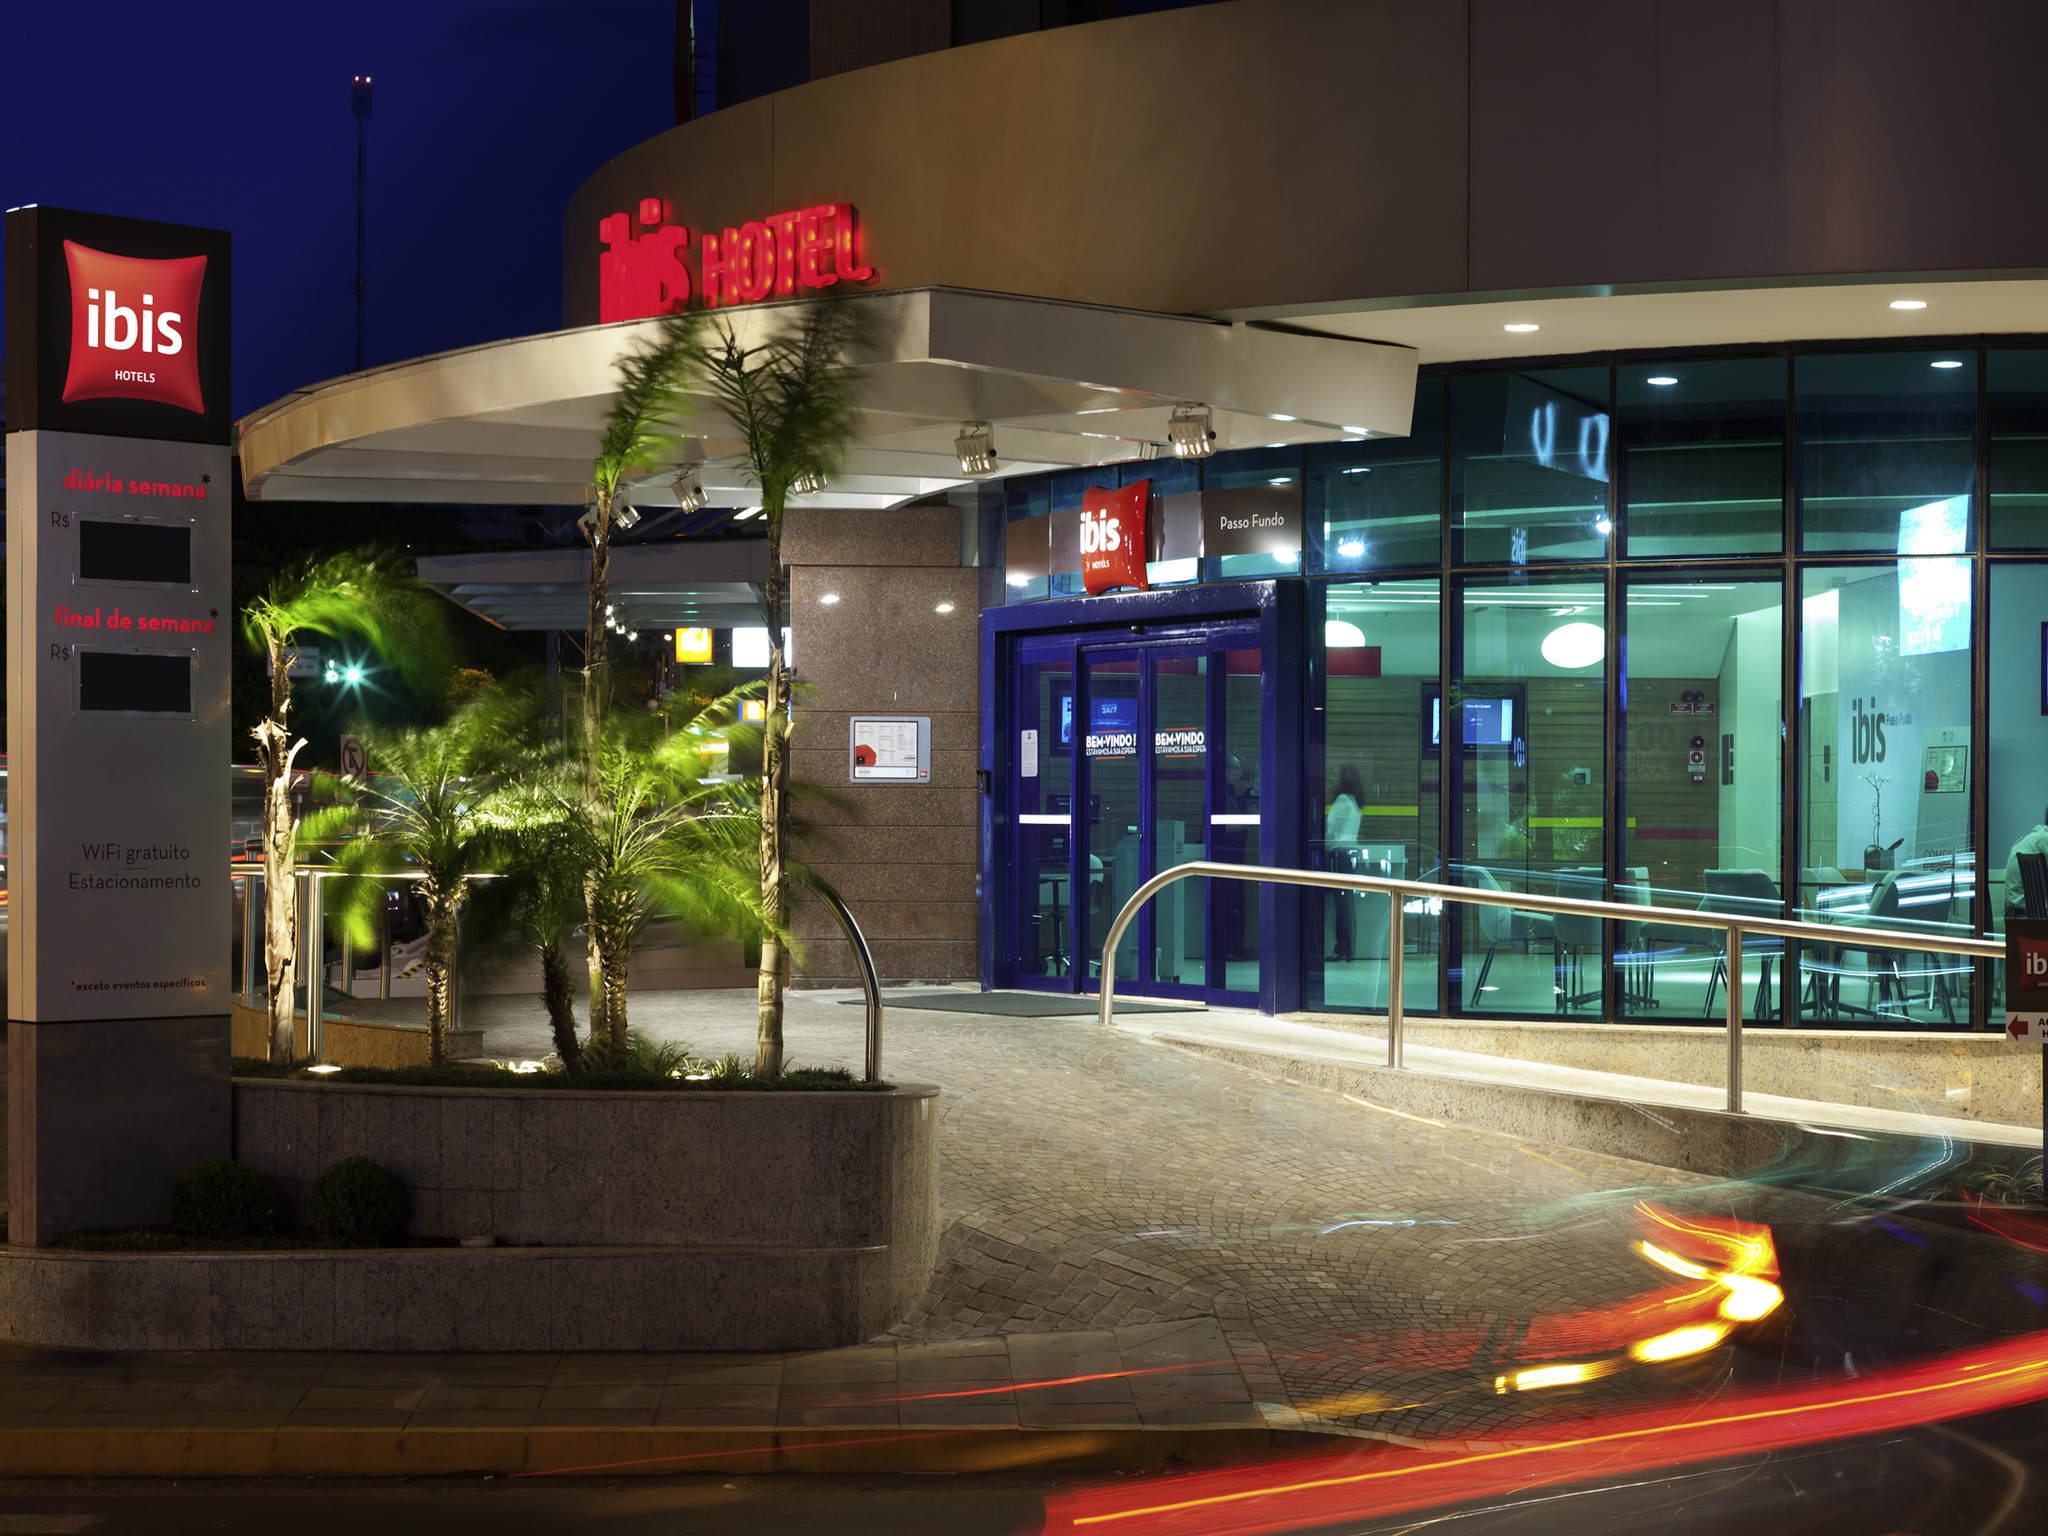 Hotel - ibis Passo Fundo Centro